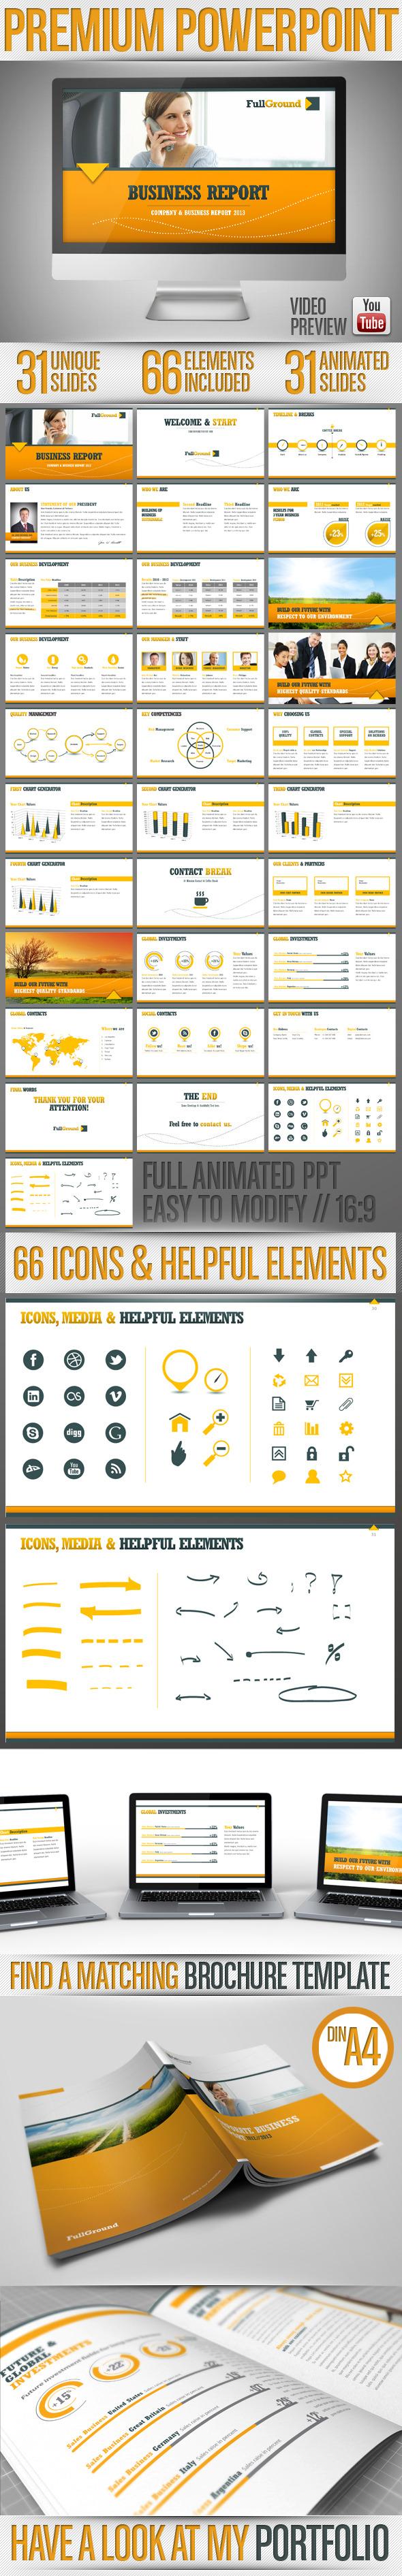 Fullground - PowerPoint Presentation Template - Business PowerPoint Templates